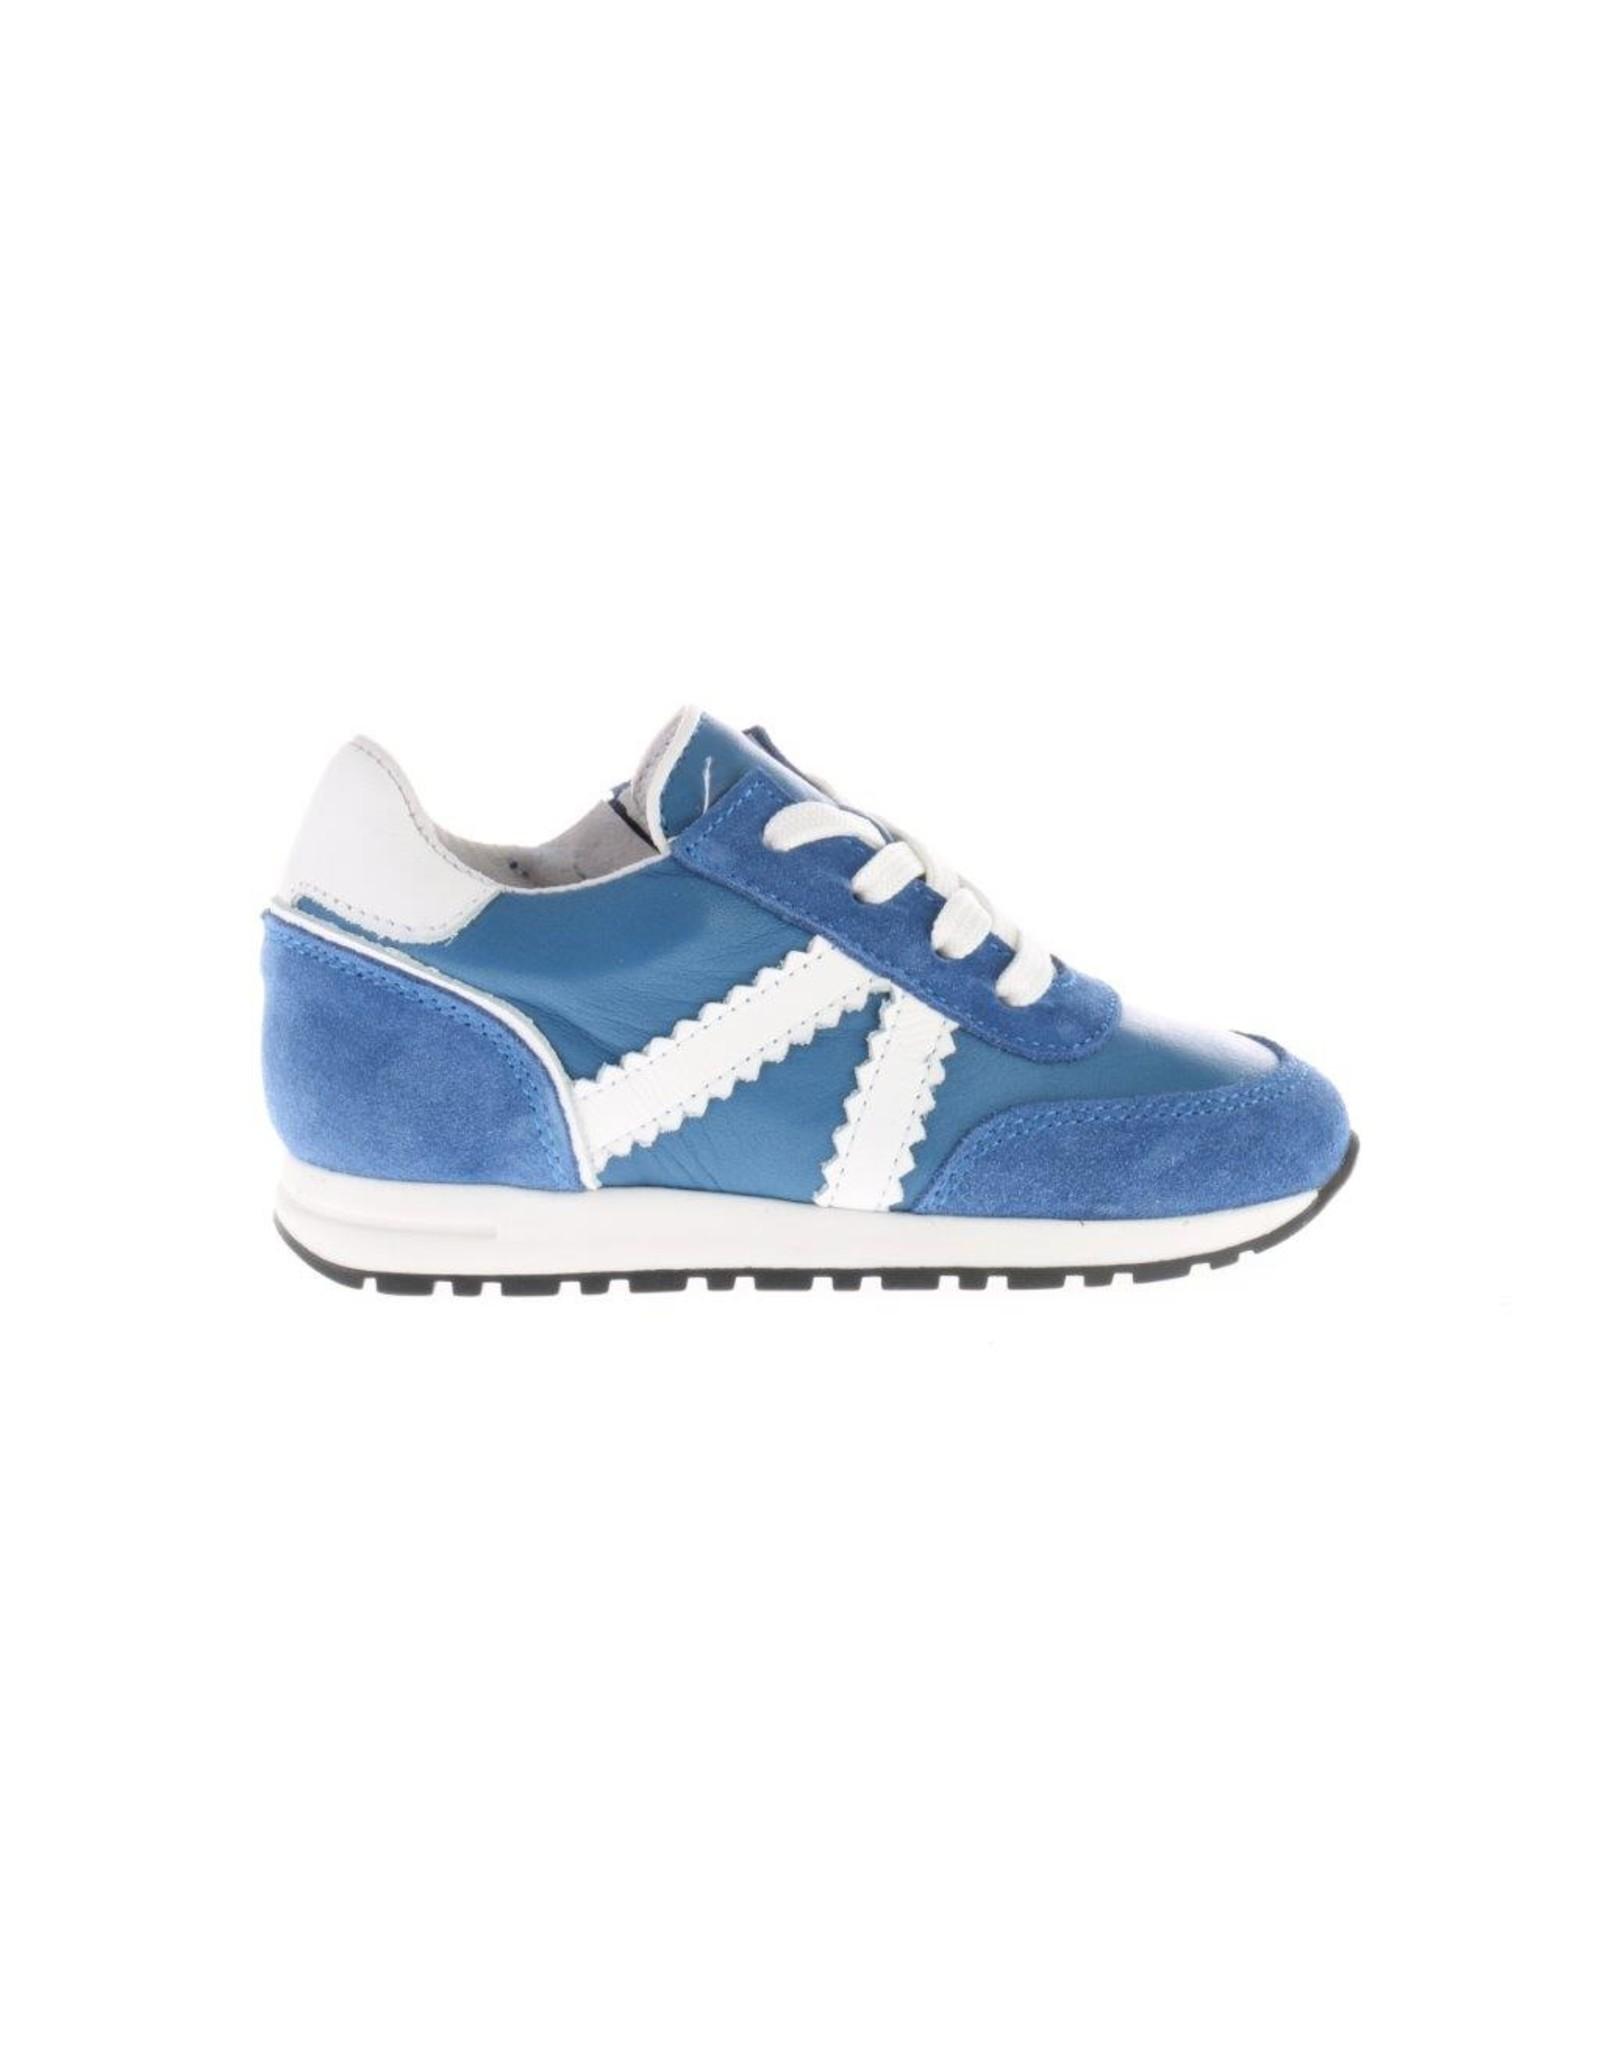 Gattino Gattino - Cobalt Blauw Sneaker